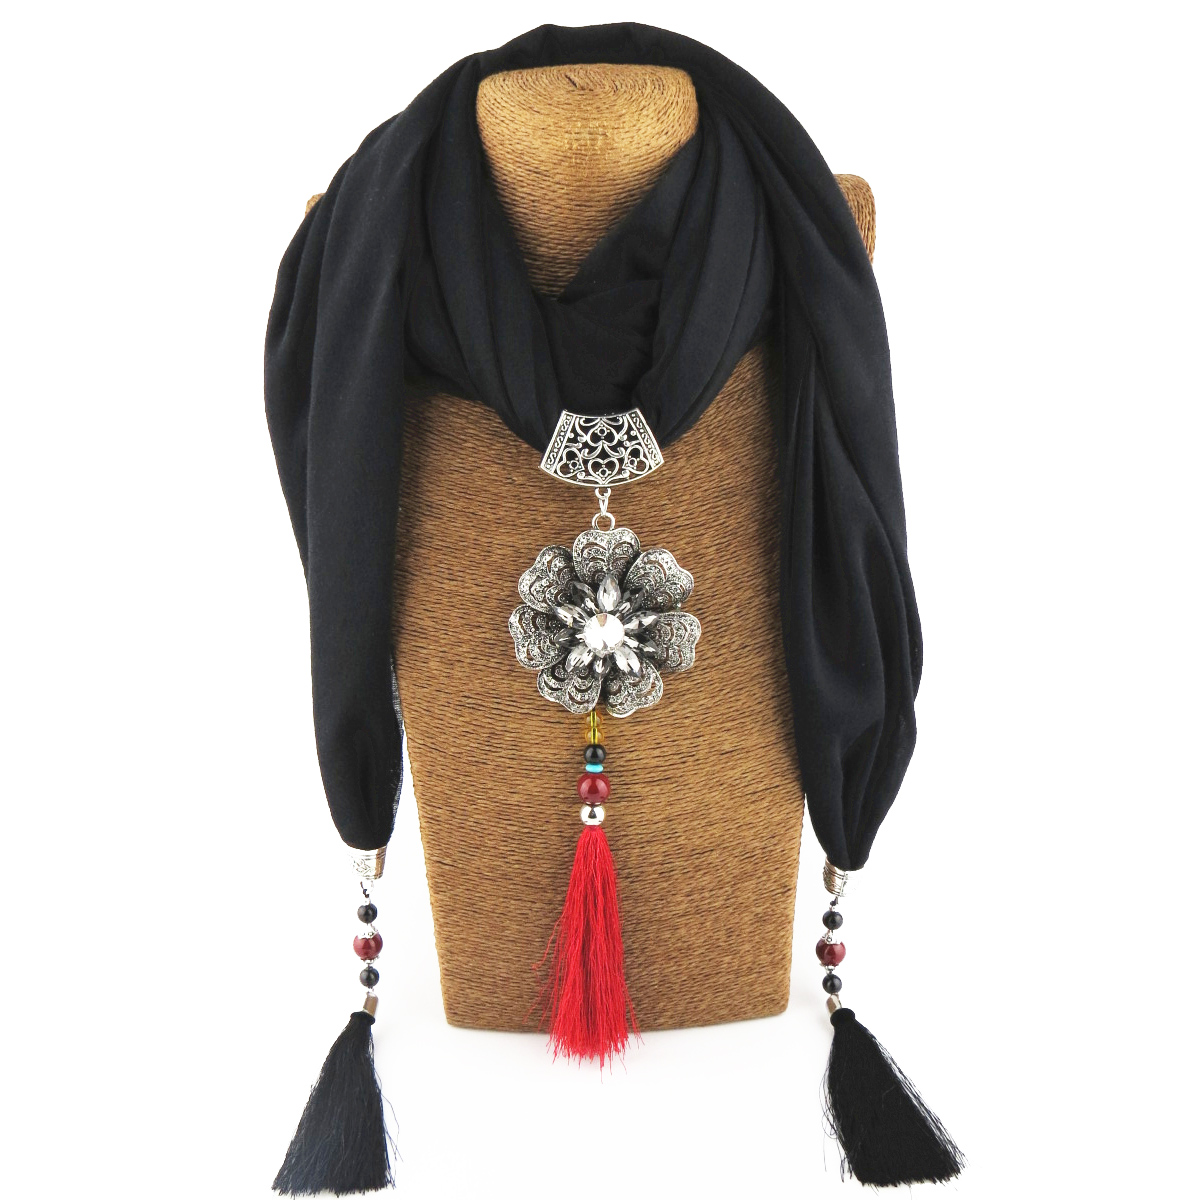 Jzhifiyer cotton polyester women foulard pendant scarf jewellery mujer shawls fringe 40x200cm hijab scarfs necklace beads shawl